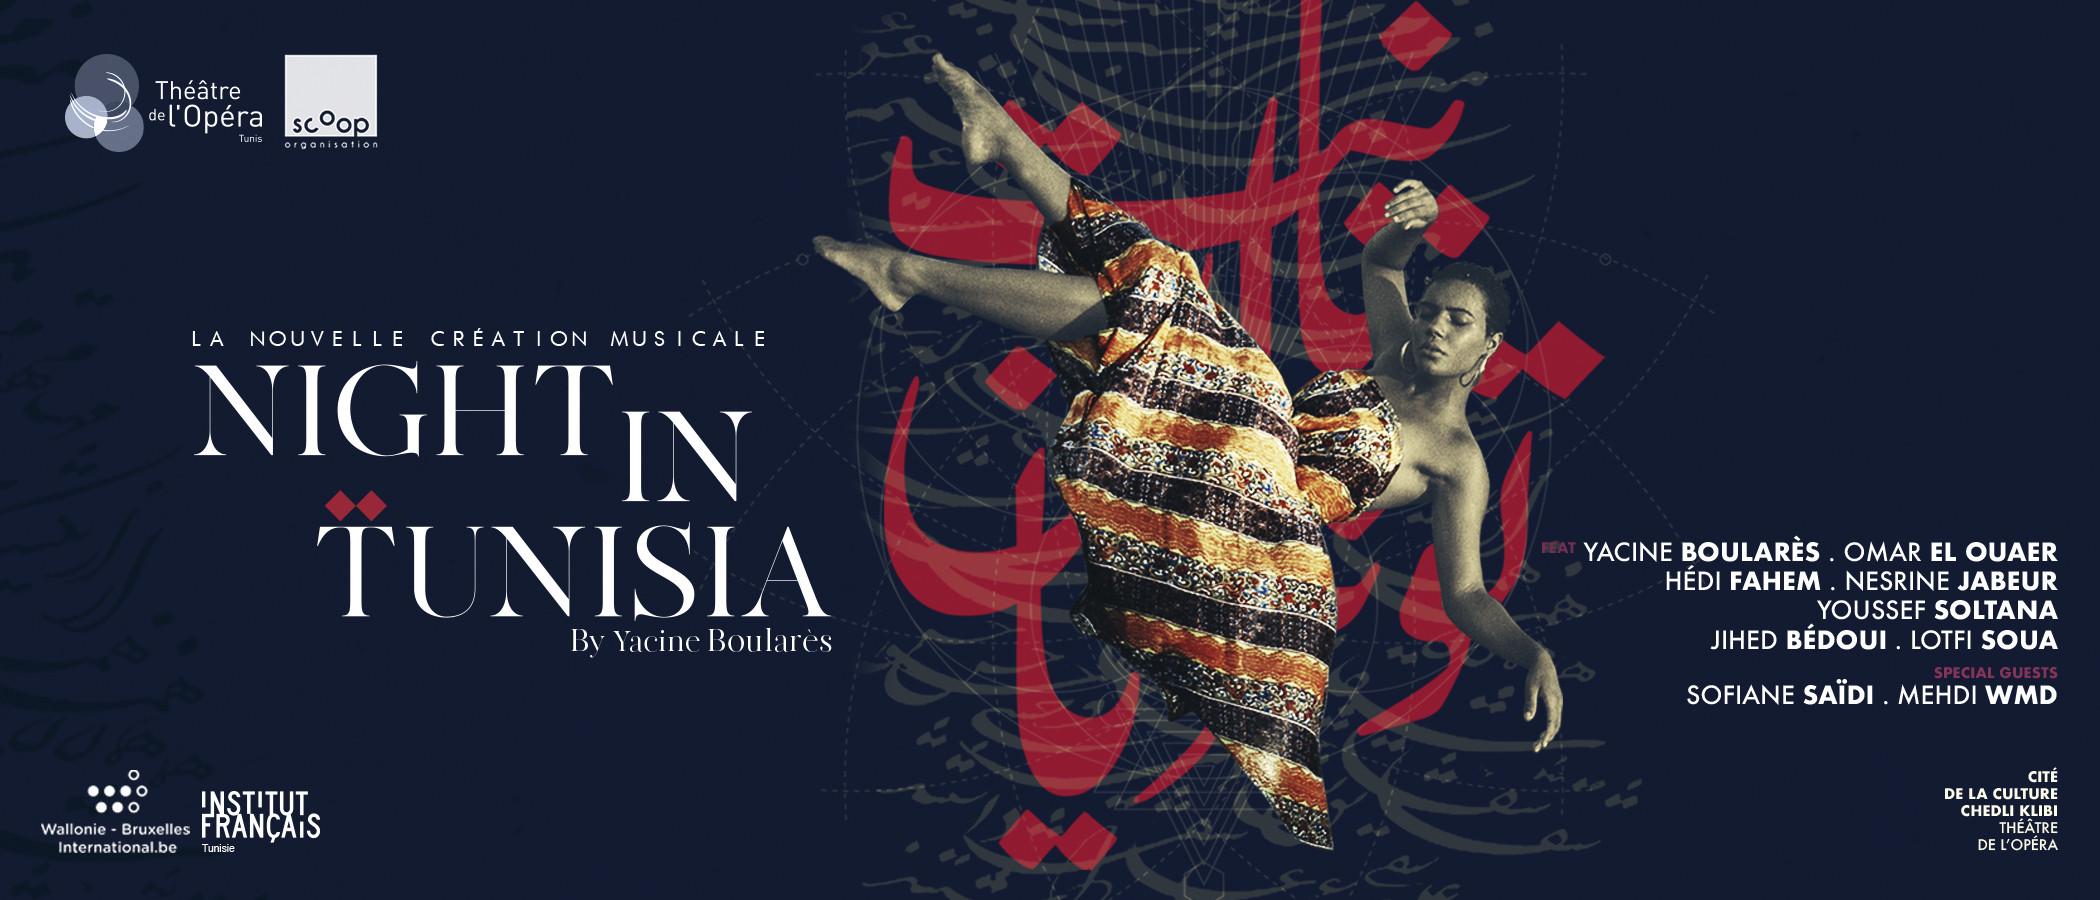 Night in Tunisia  une création musicale originale